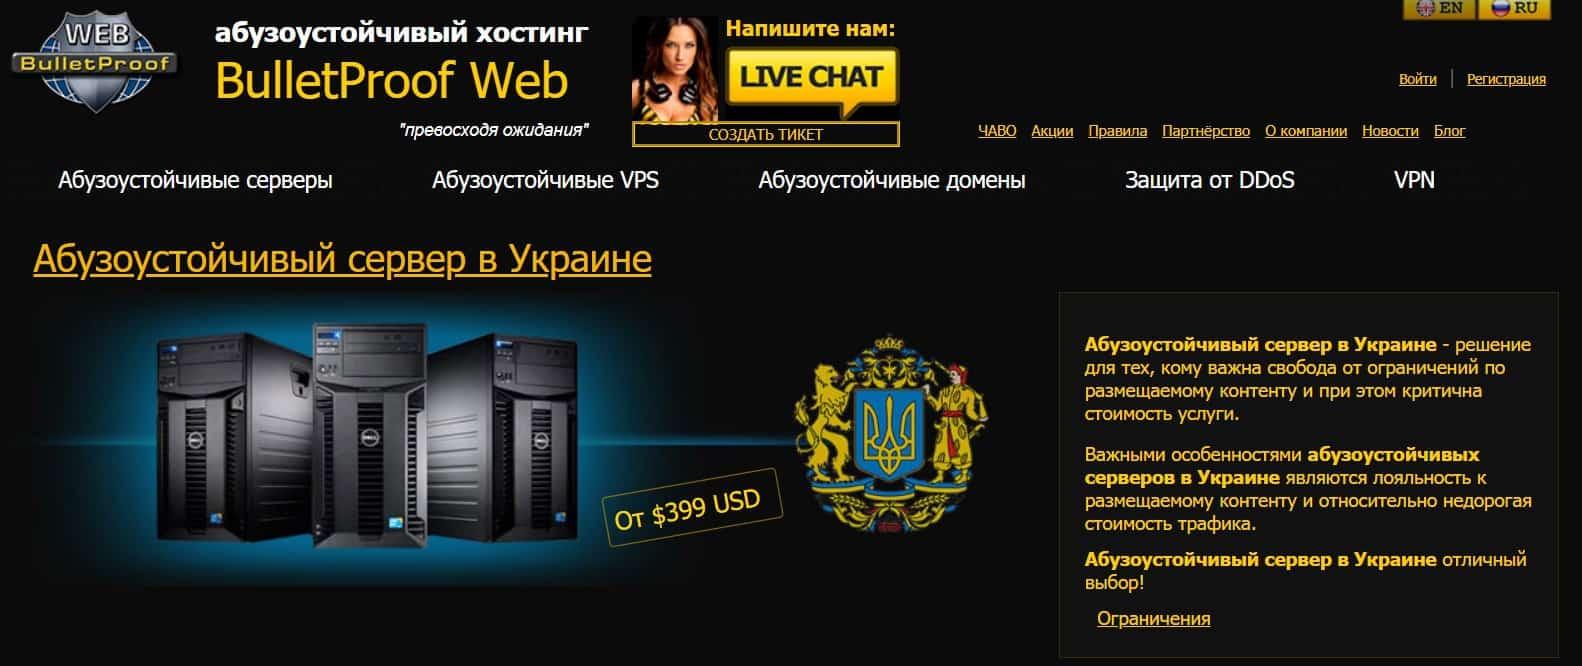 Advertisement for Ukraine-based bulletproof hosting servers